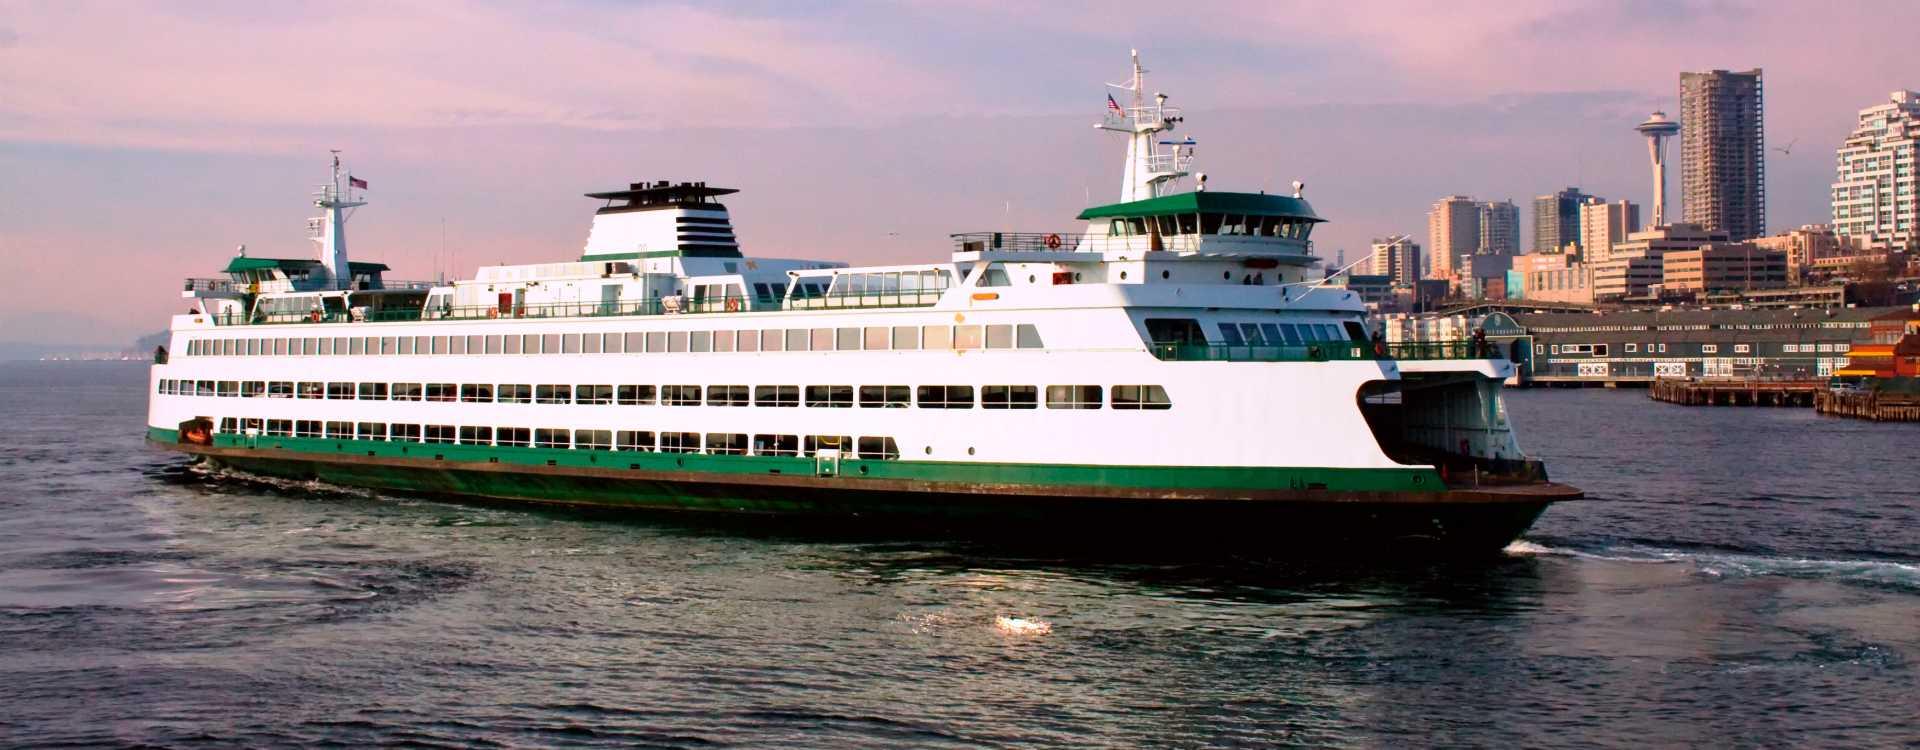 Washington State Ferry in Seattle